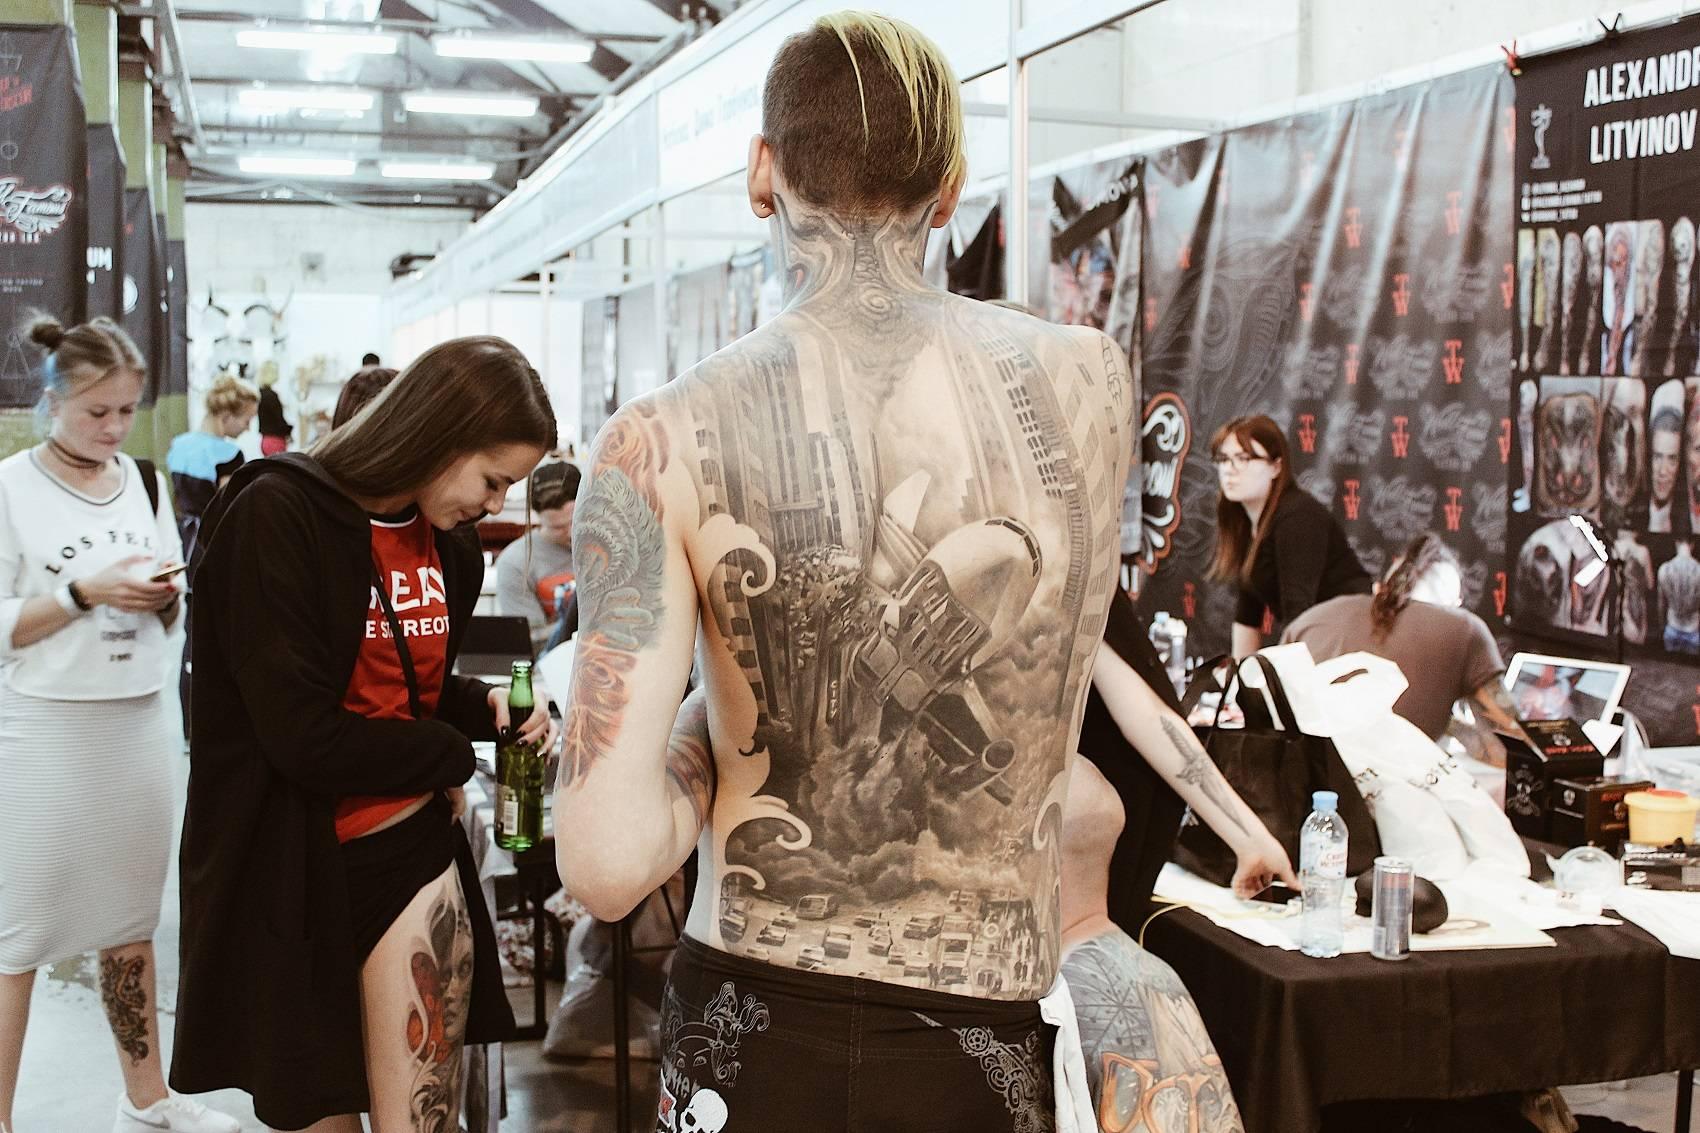 International Moscow Tattoo Week - Stone Forest